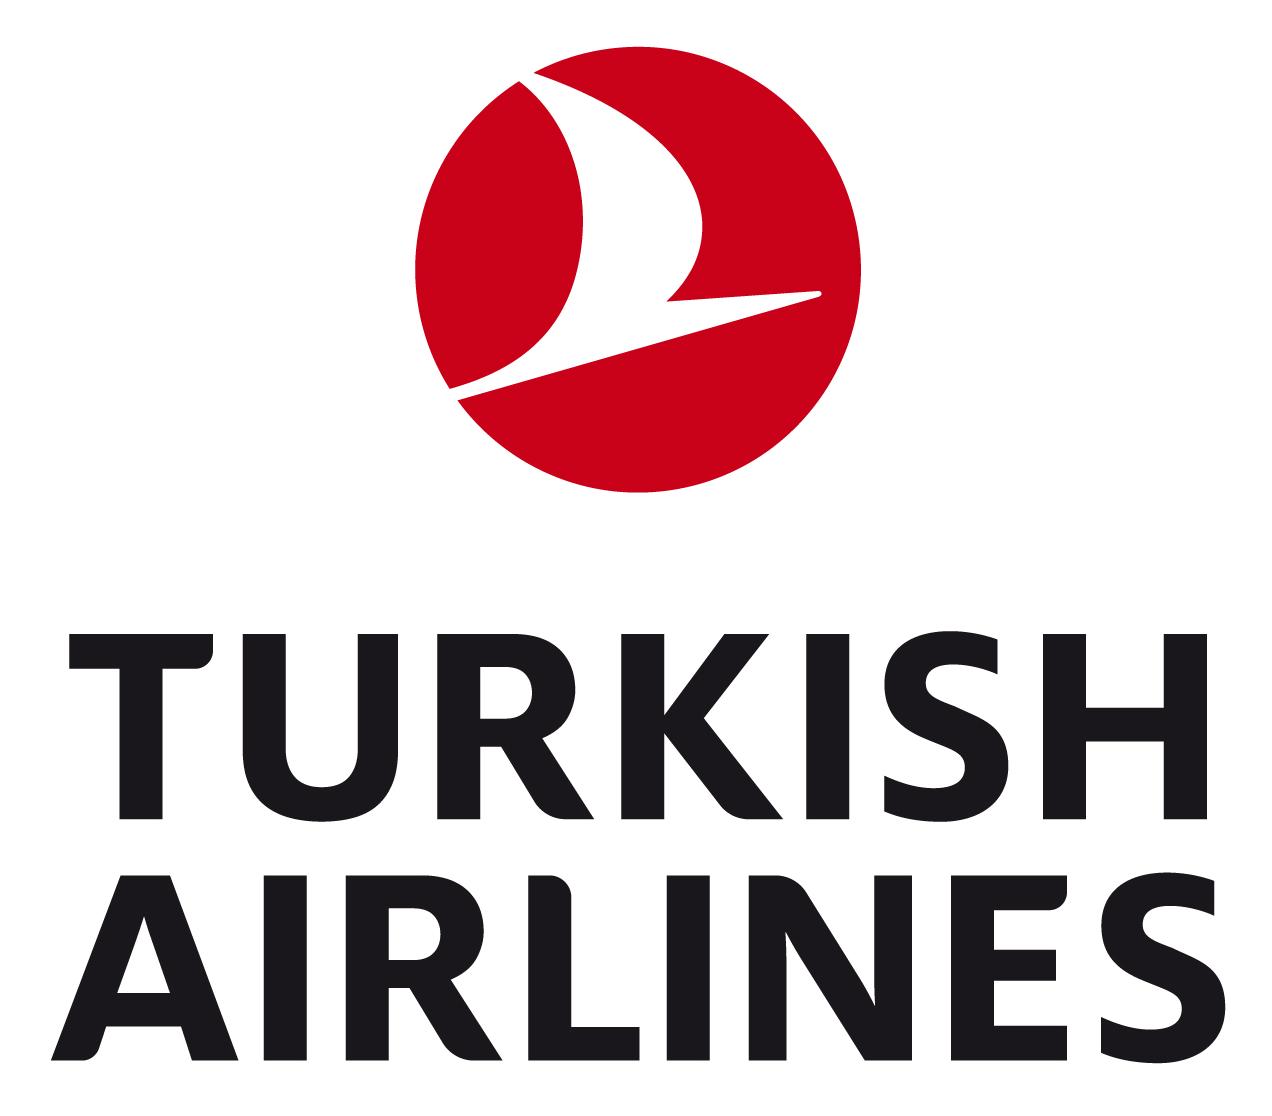 Turkish Airlines Isologotype